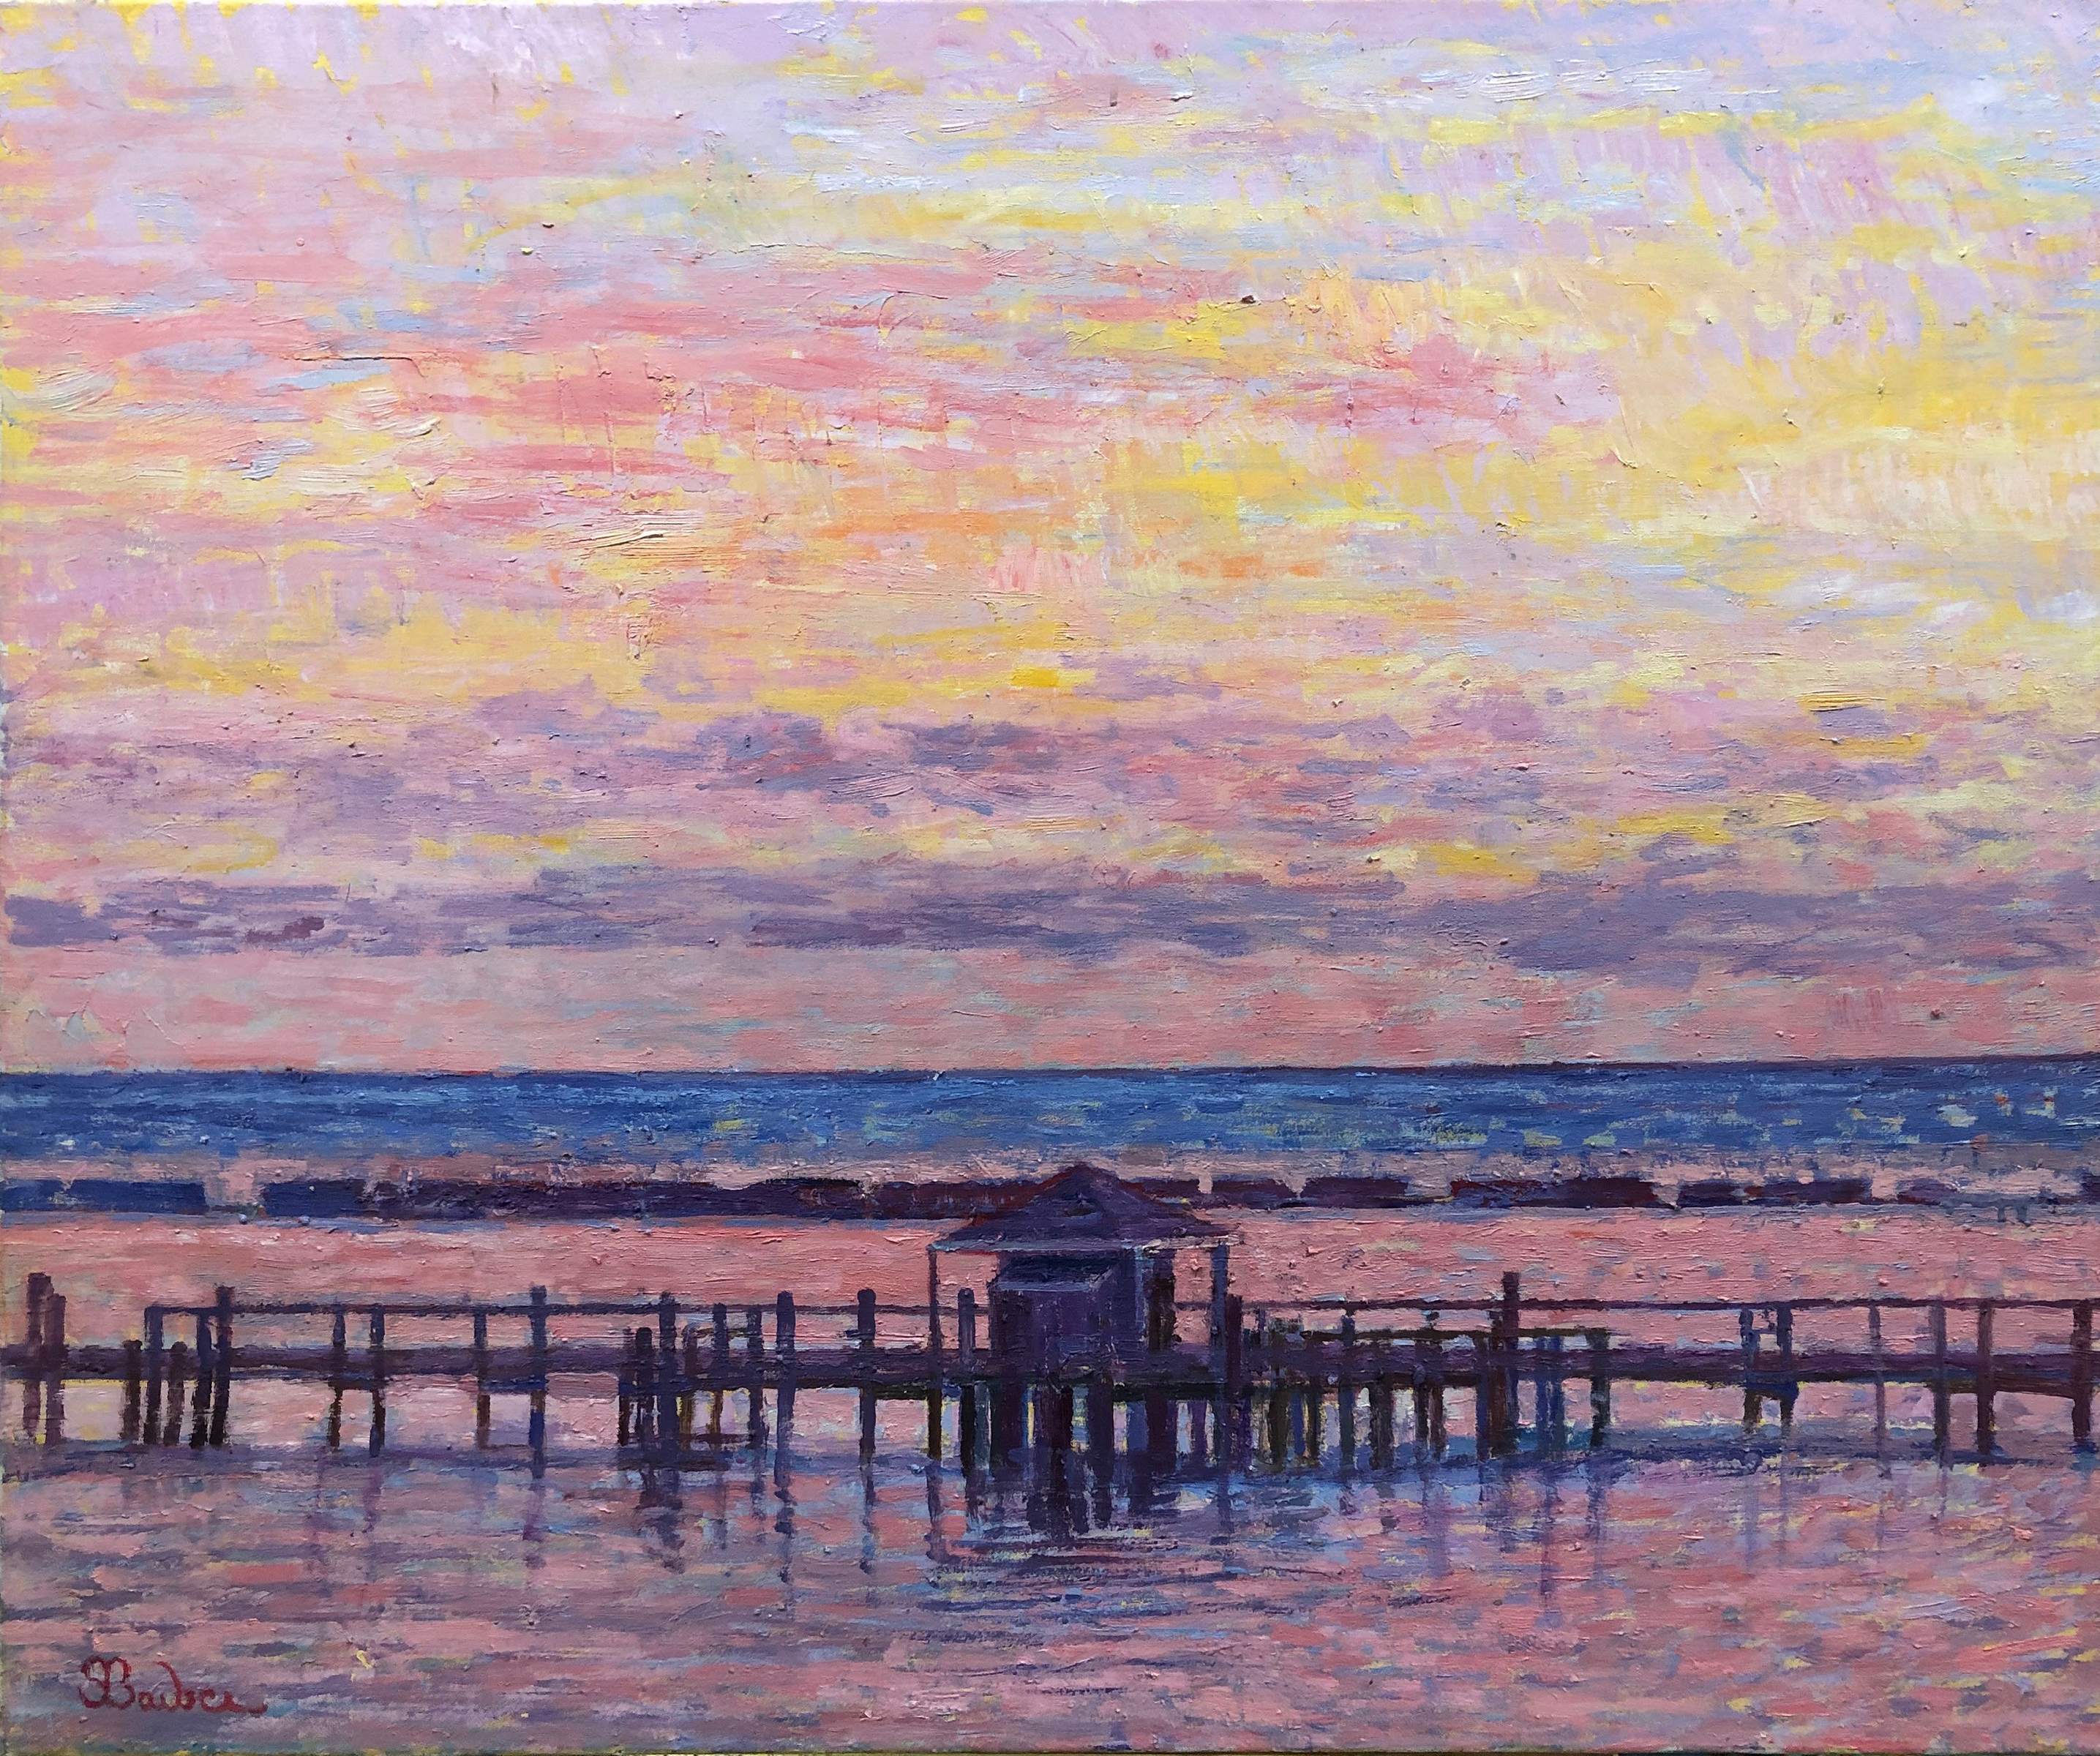 Sunrise at Hyannis Port